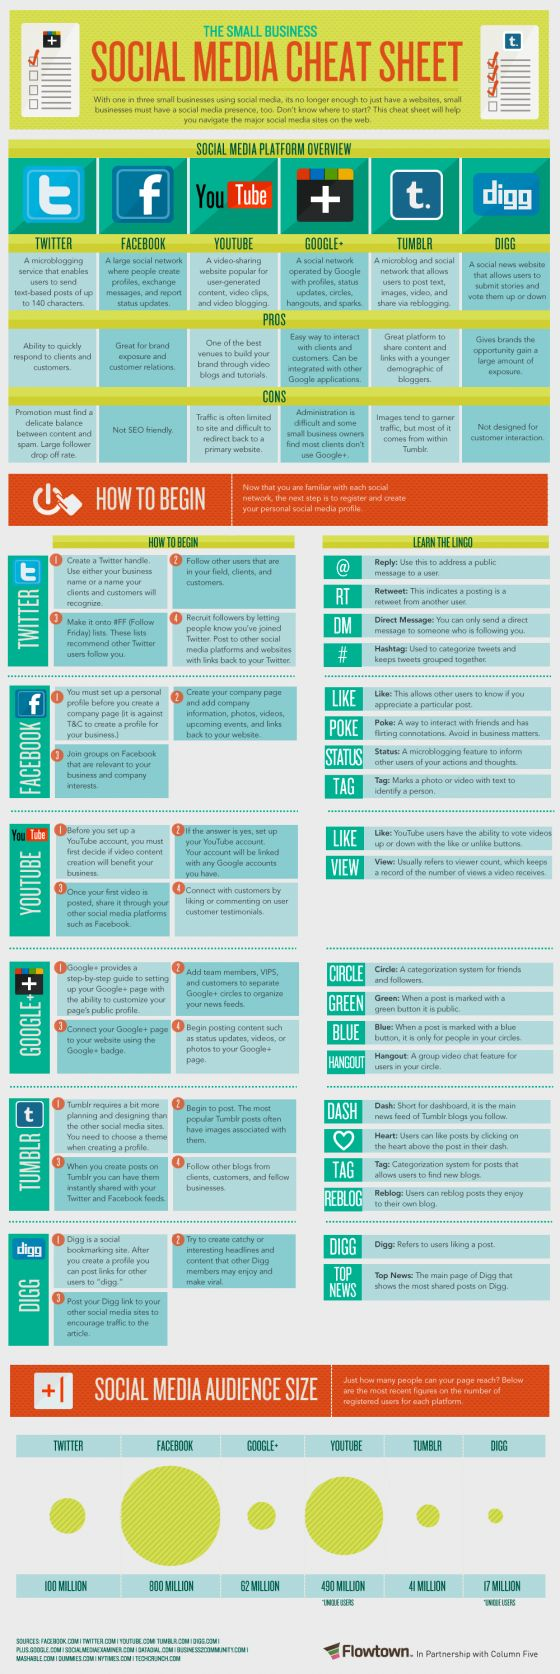 The Small Business Social Media Cheat Sheet via Flowtown